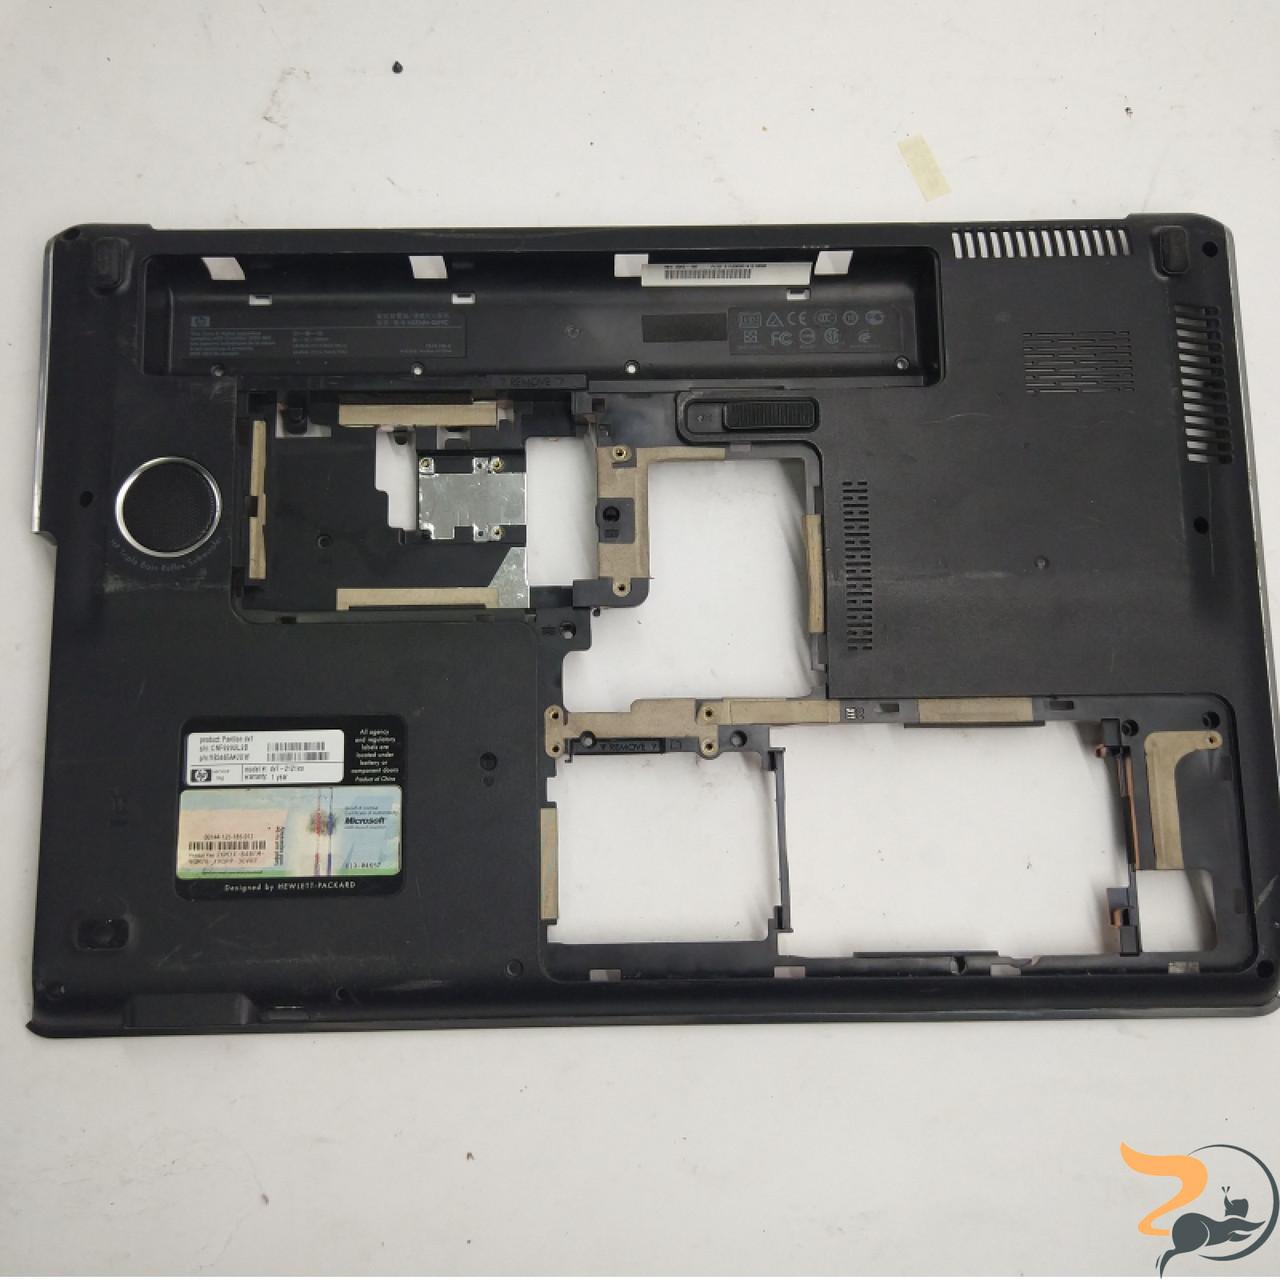 "Нижня частина для ноутбука HP Pavilion dv7, dv7-2106eg, 17.3"", 518901-001, Б/В"